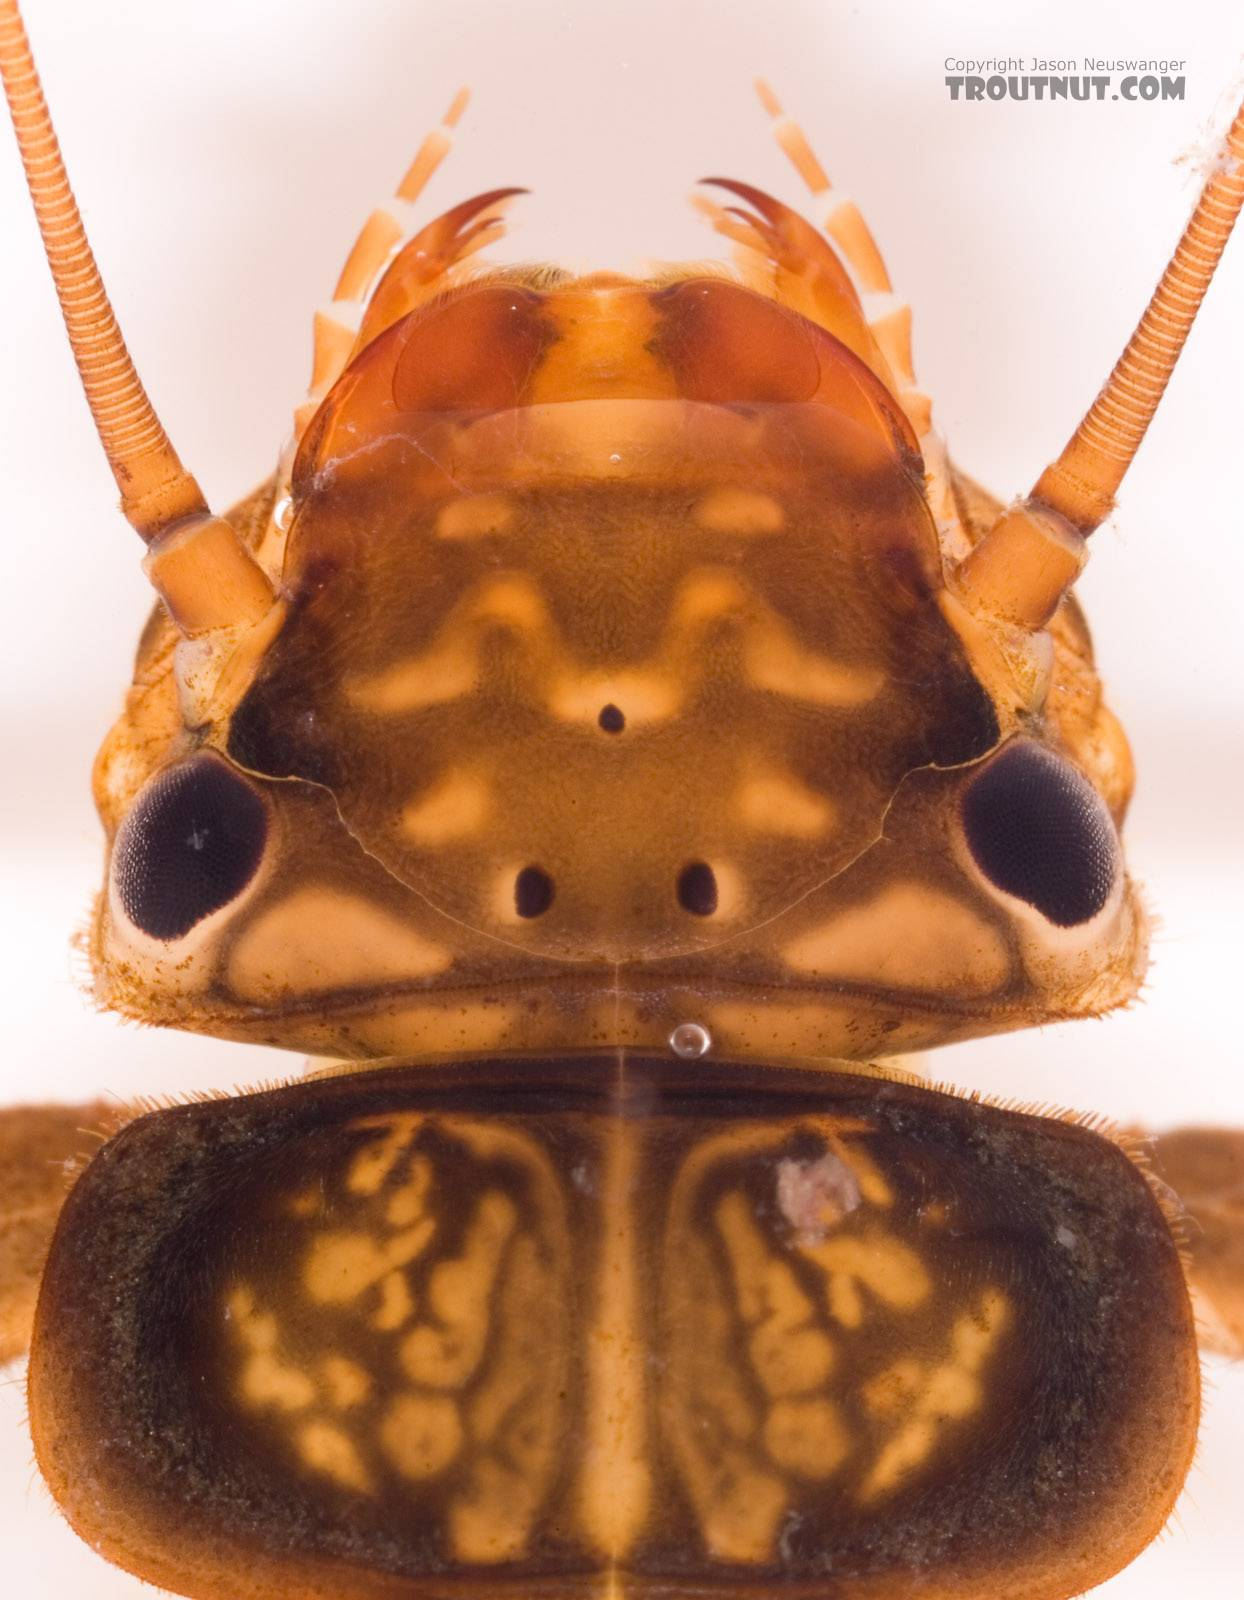 Paragnetina media (Embossed Stonefly) Stonefly Larva from Fall Creek in New York